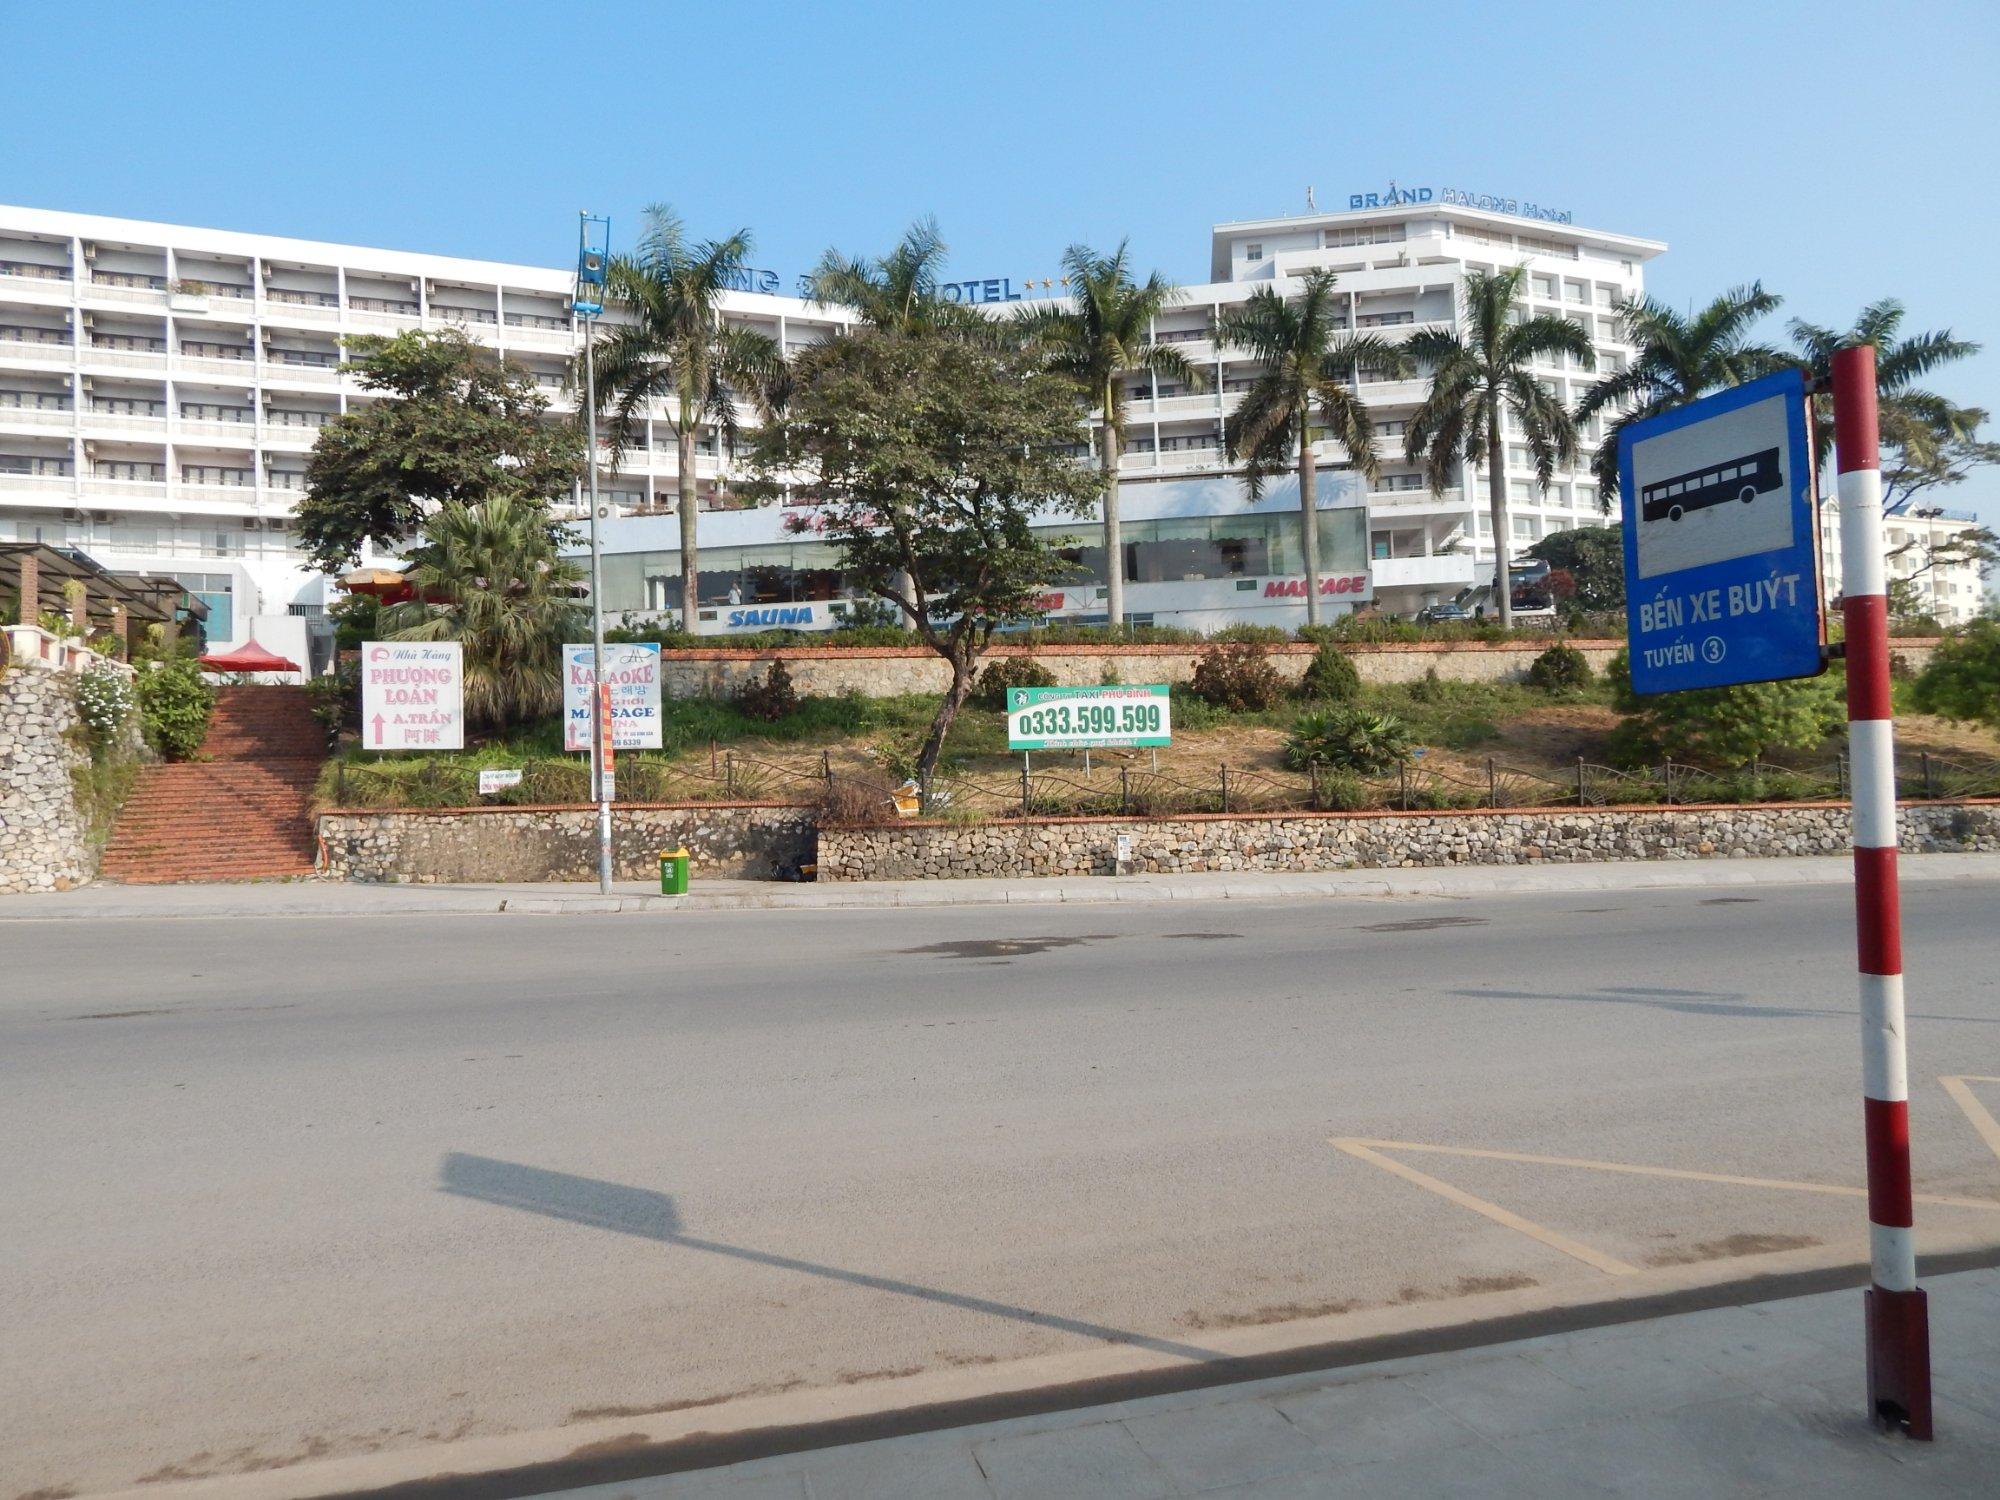 The Congdoan Hotel